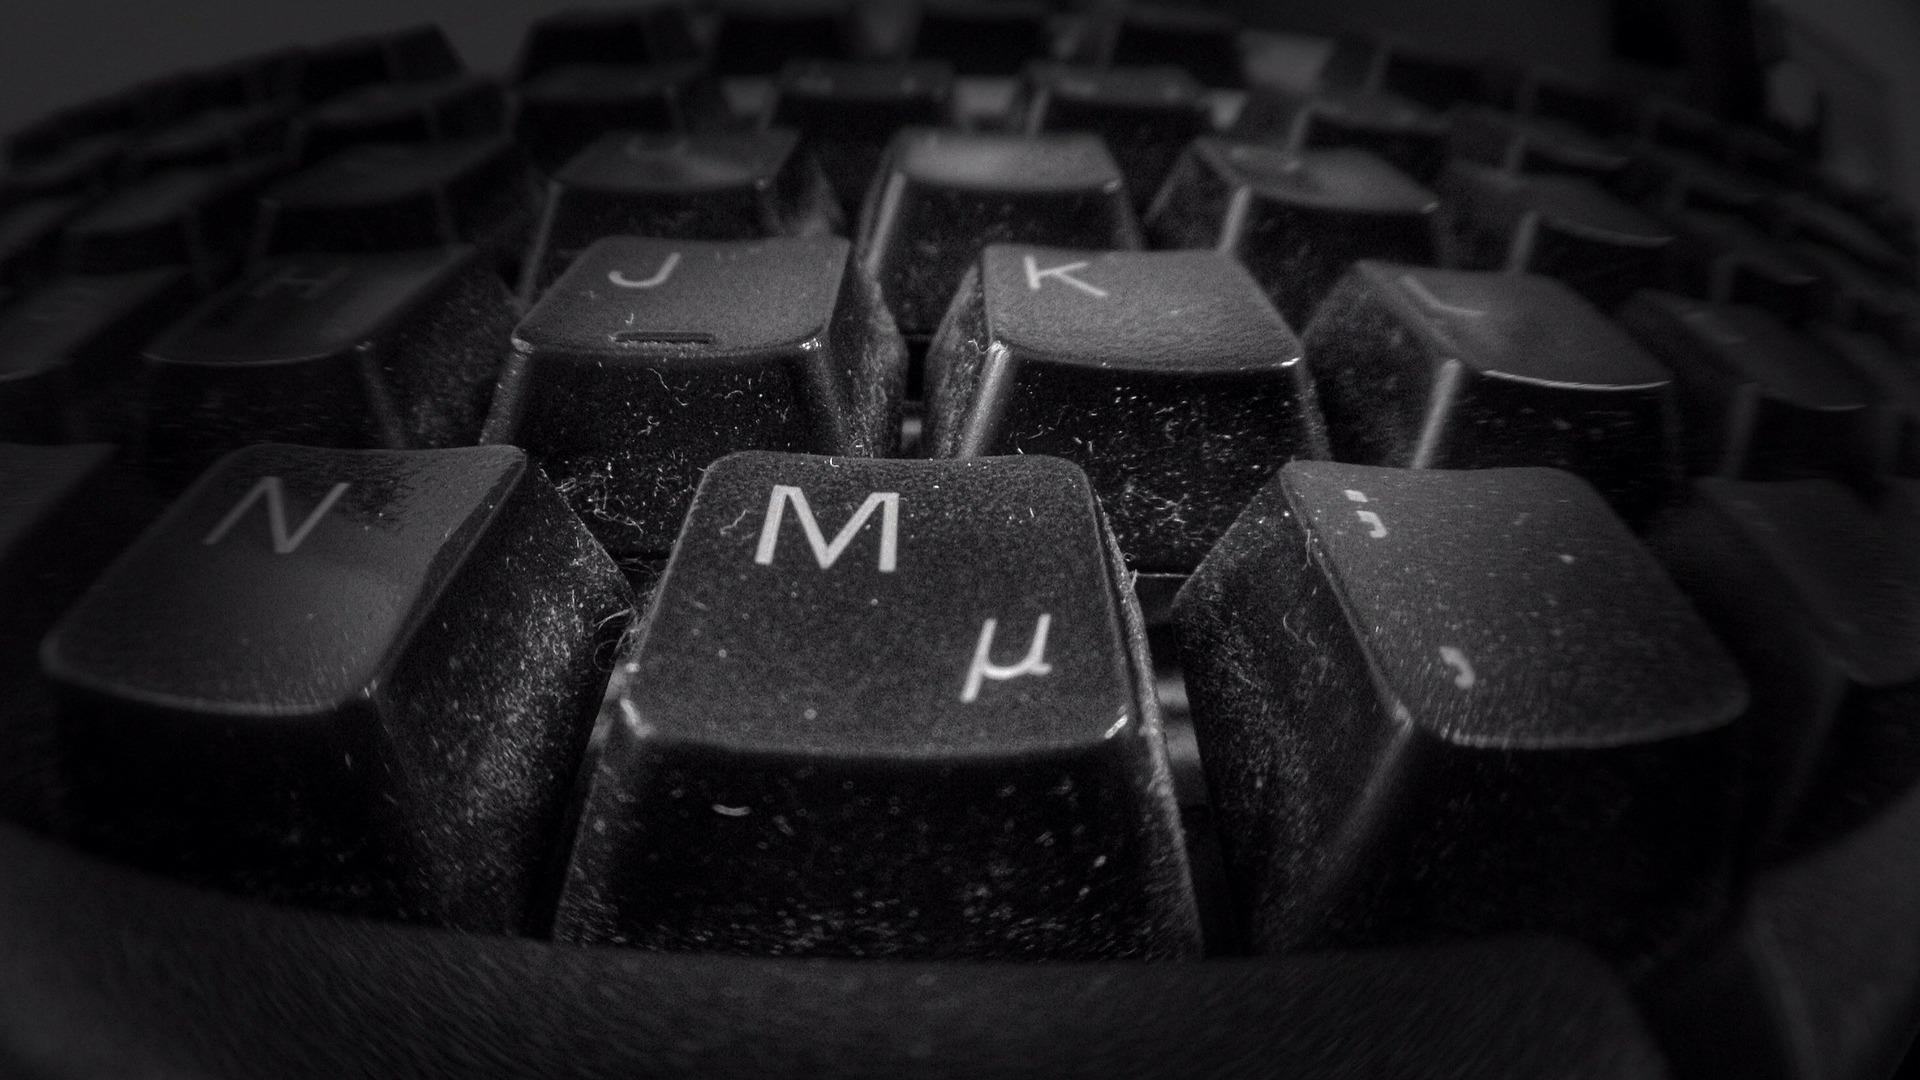 keyboard-277799_1920